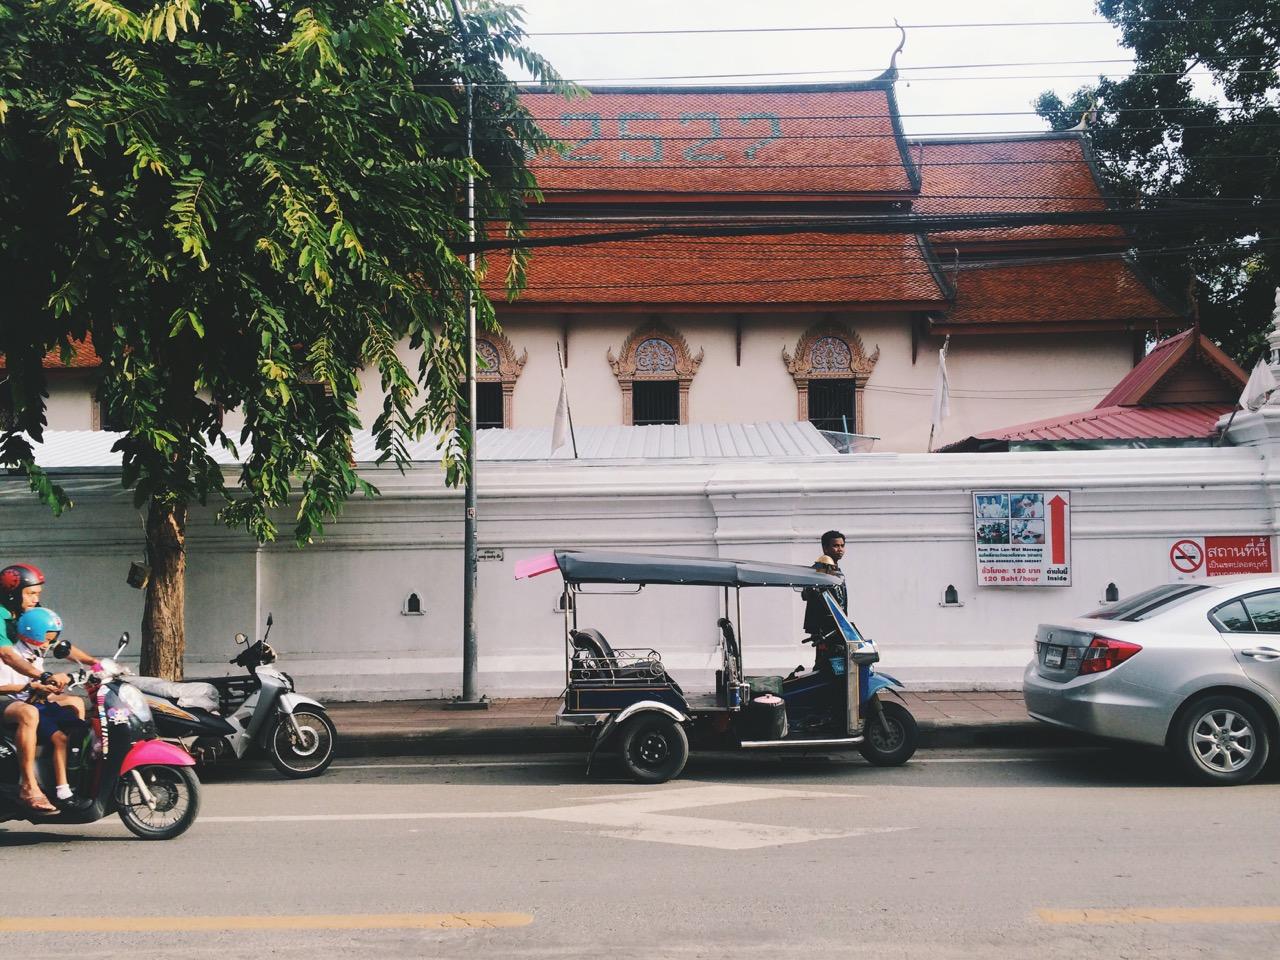 Путешествие по Таиланду, Чиангмай: Храм (Wat Si Koet)